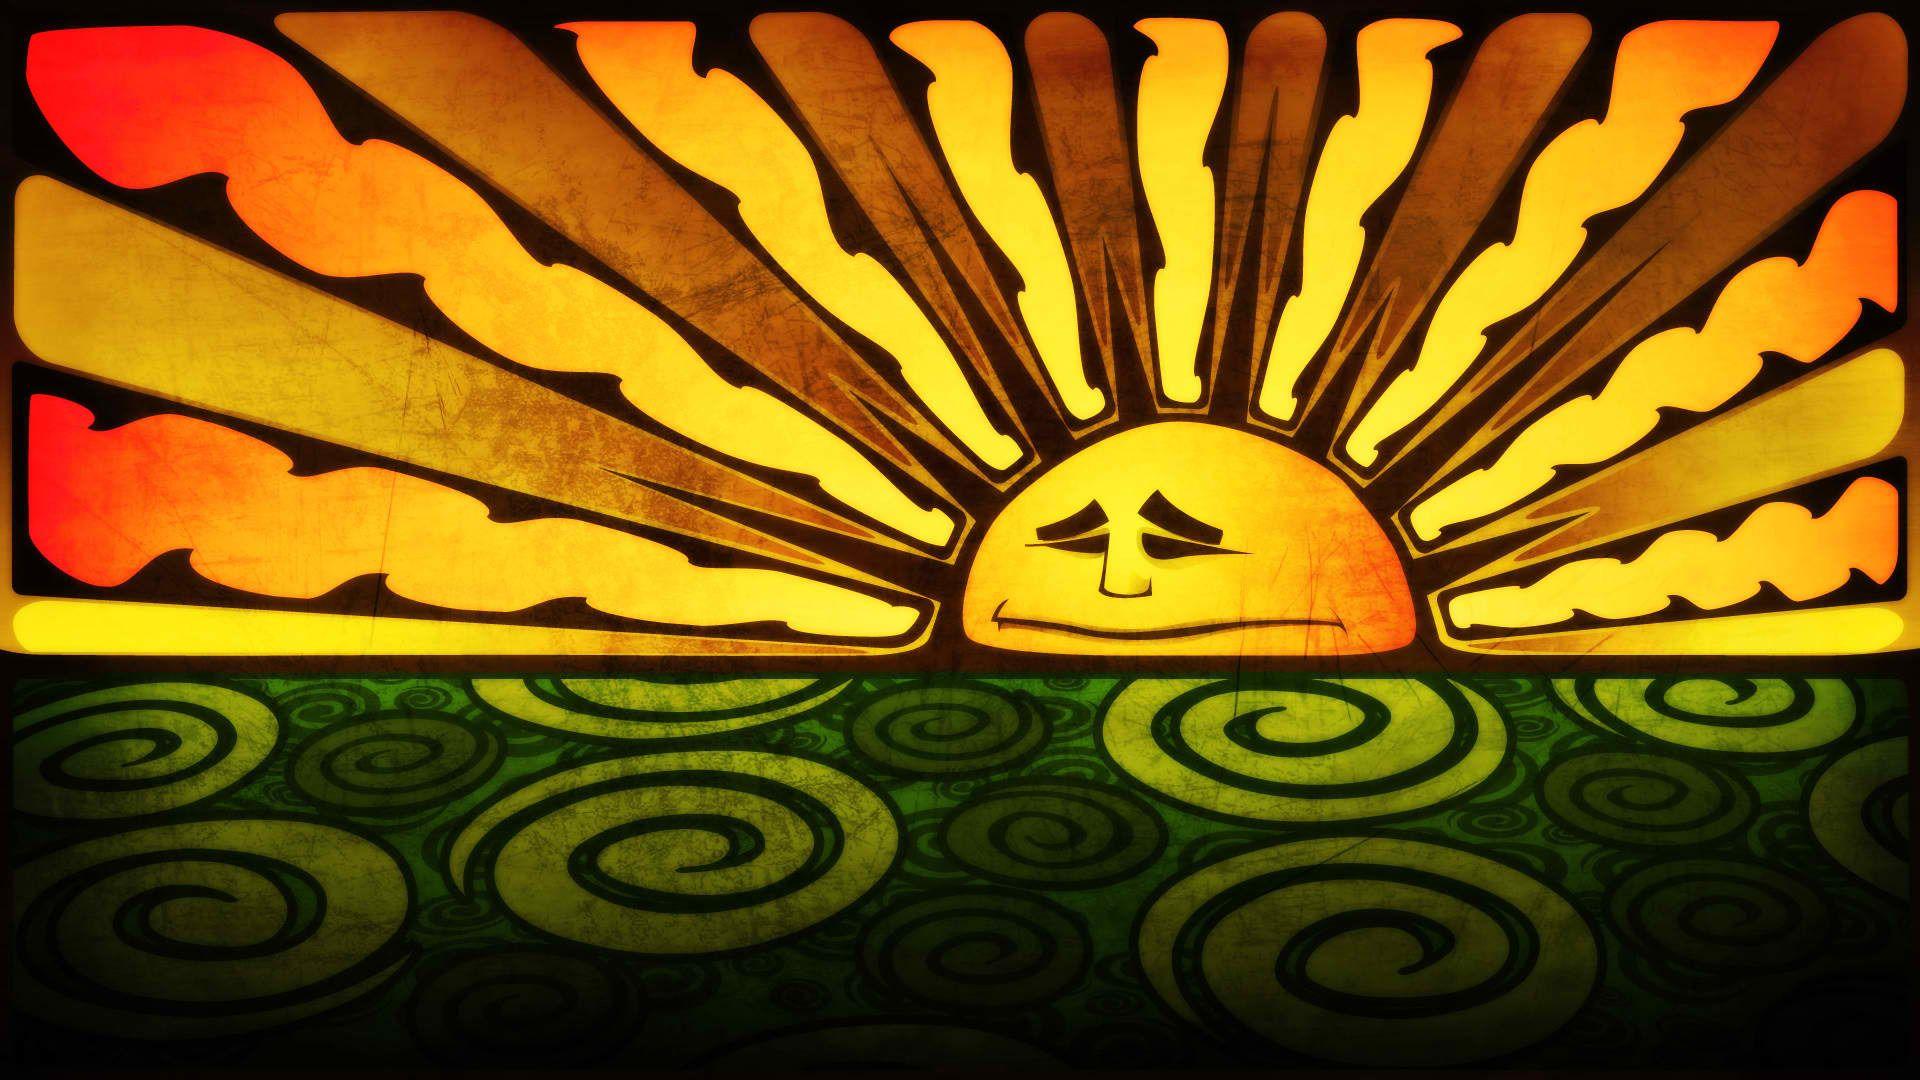 Download Wallpaper Figure, Color, The Sun, Section Miscellanea